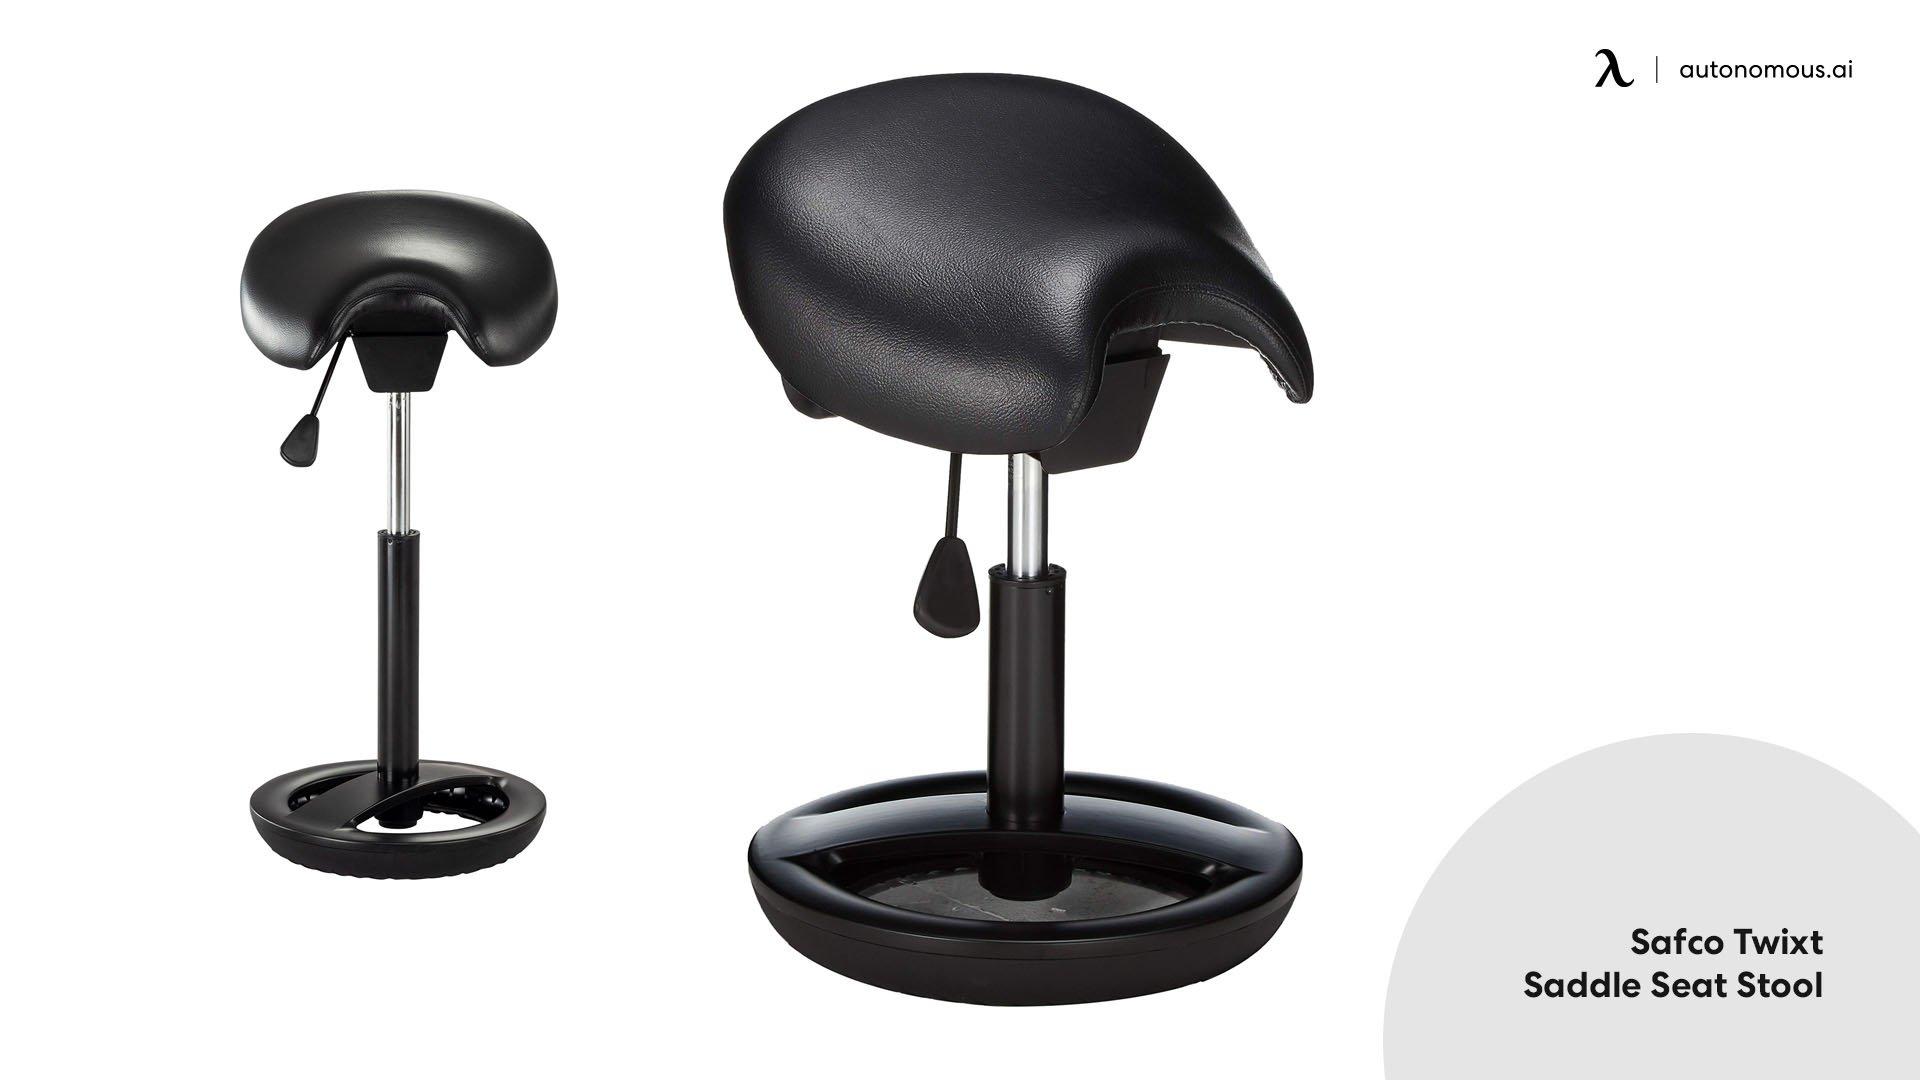 Safco Twixt Saddle Seat Stool